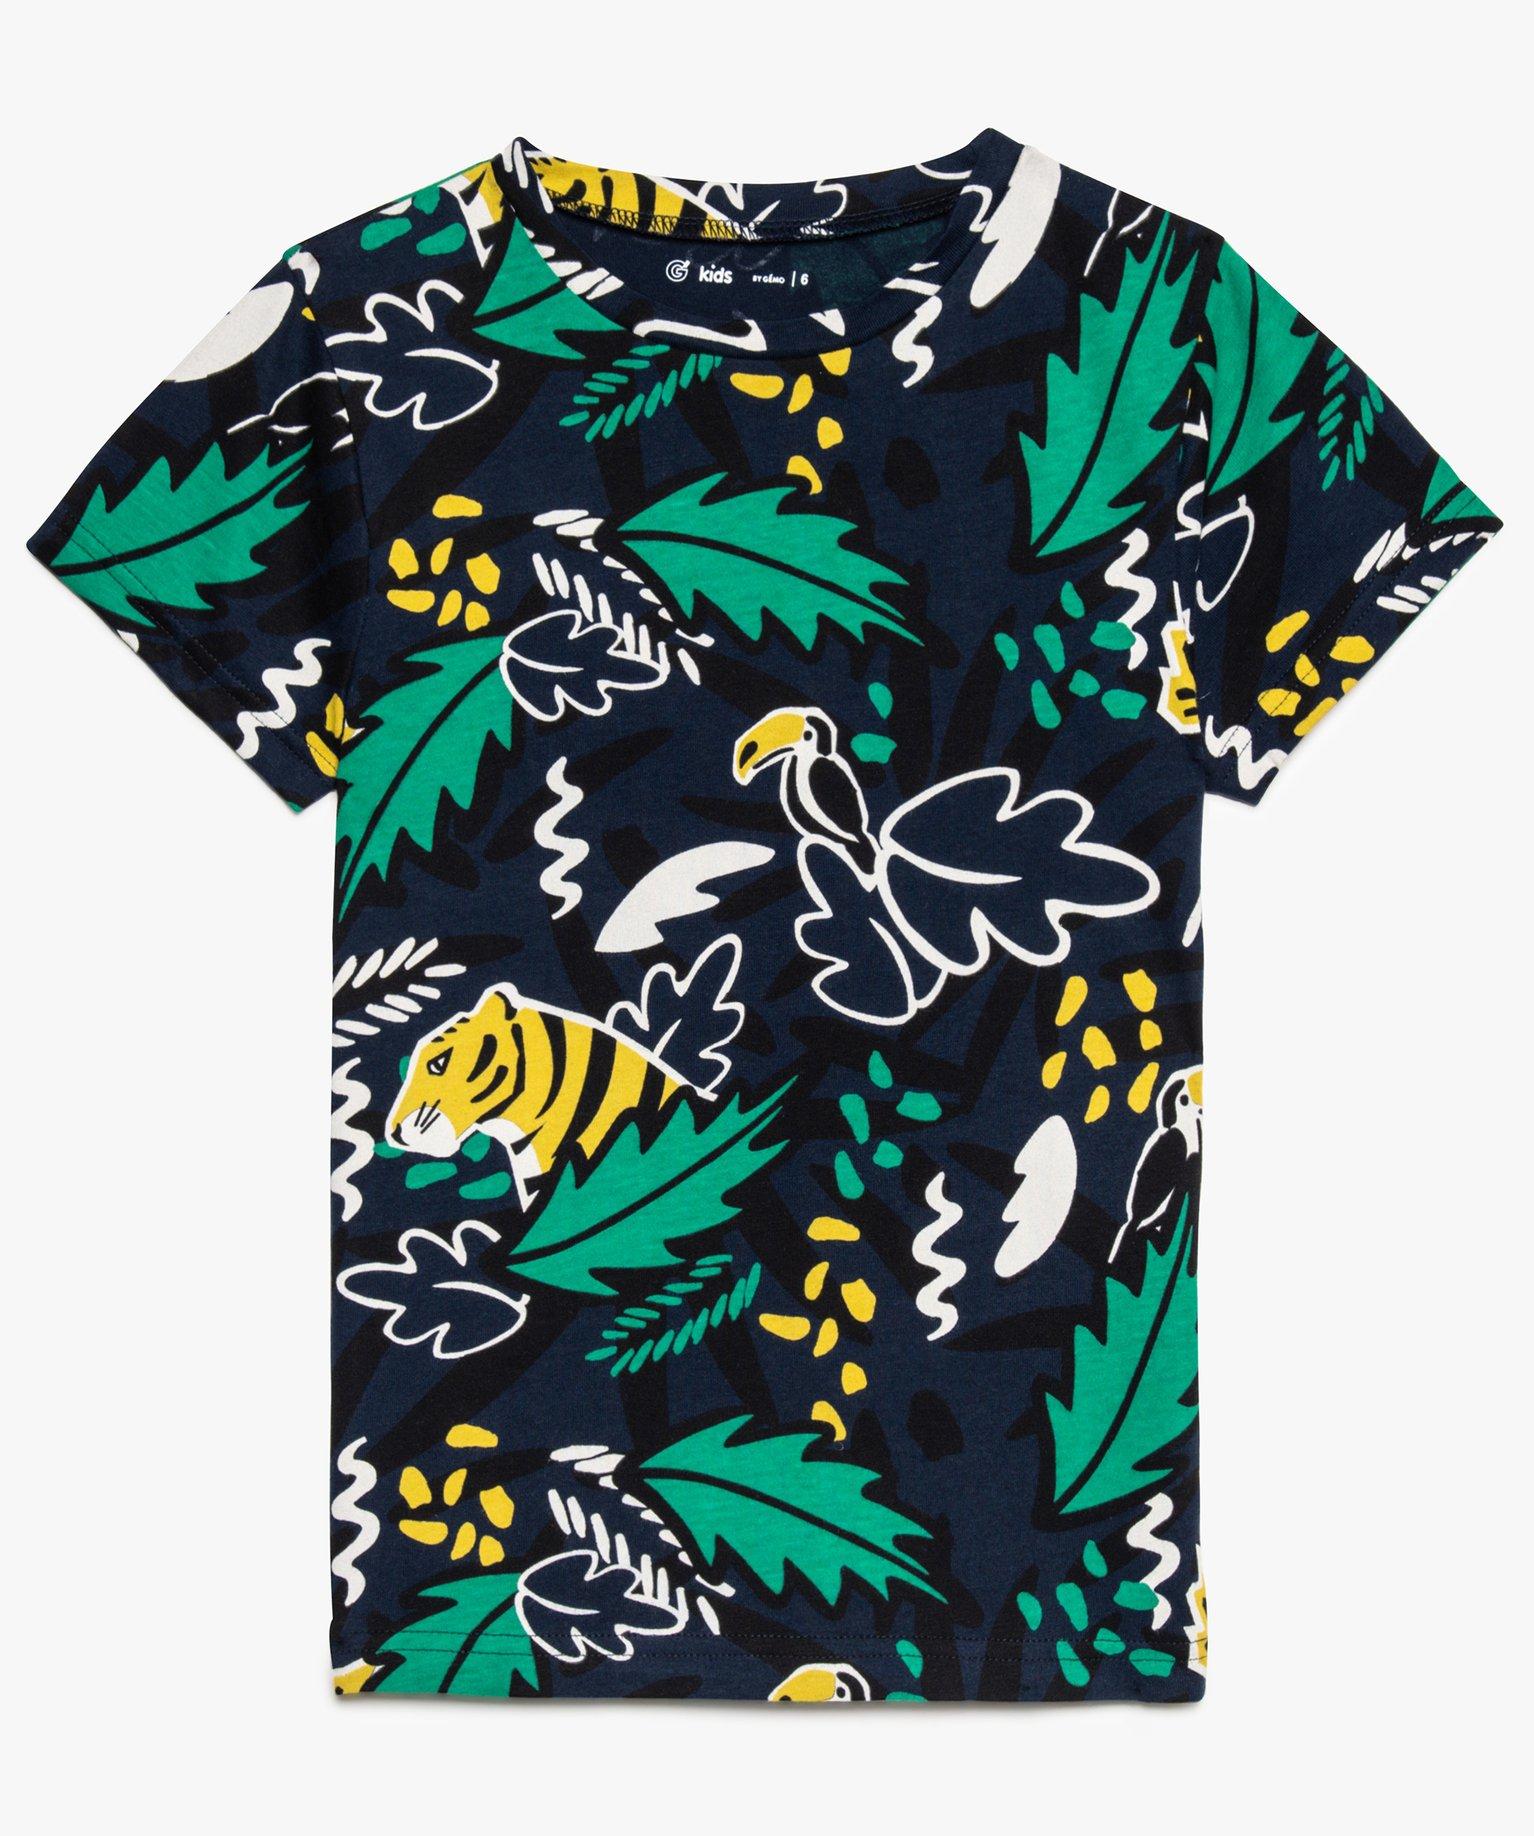 Tee-shirt garçon imprimé esprit jungle